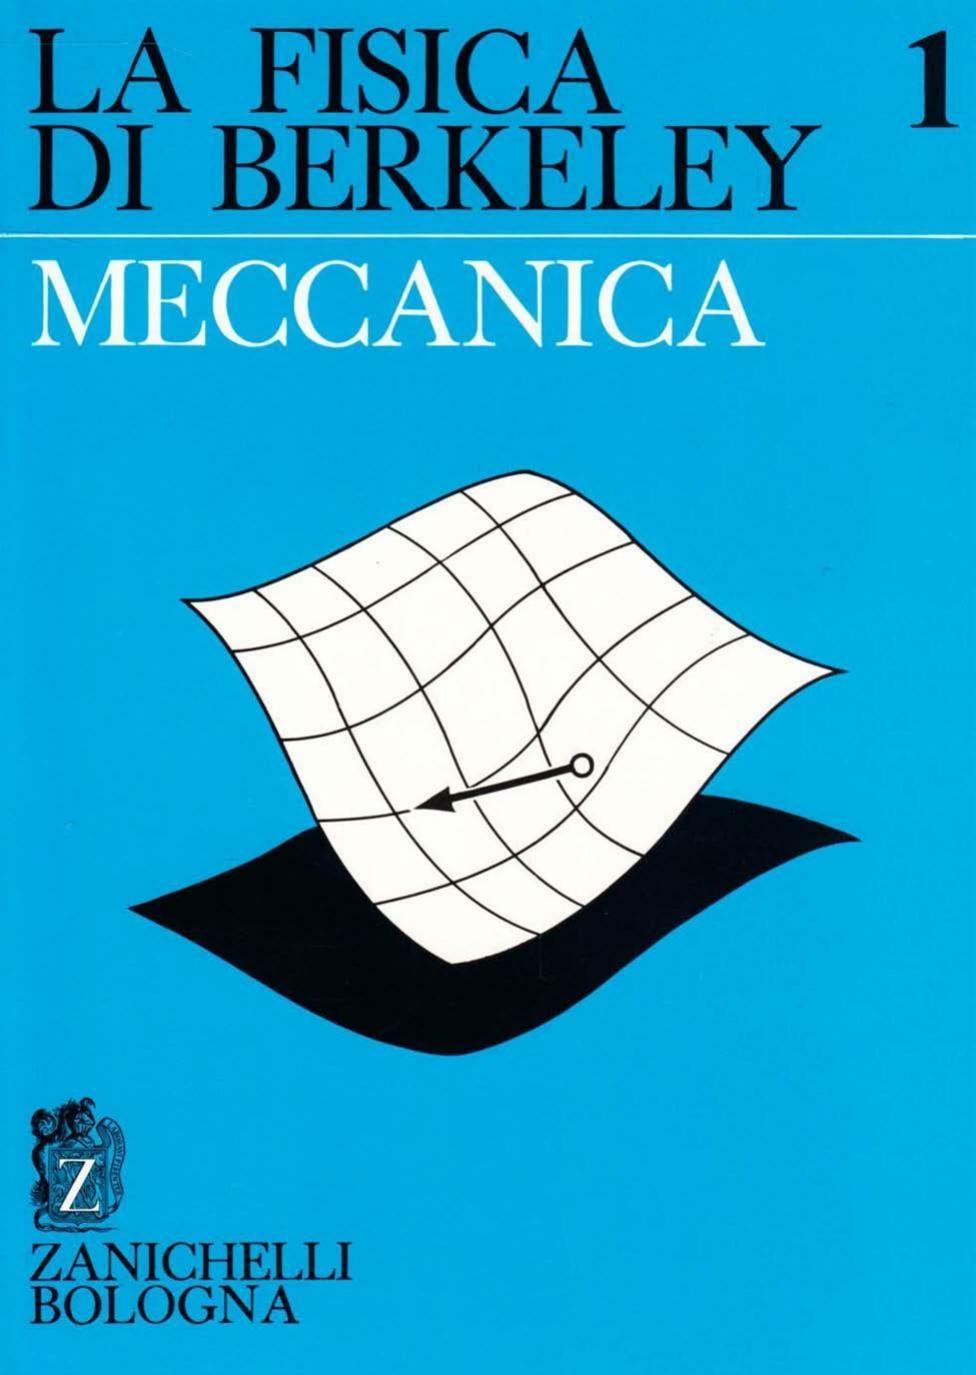 C. Kittel, W. D. Knight, M. A. Ruderman - La fisica di Berkeley. Meccanica. Vol.1 (1970)